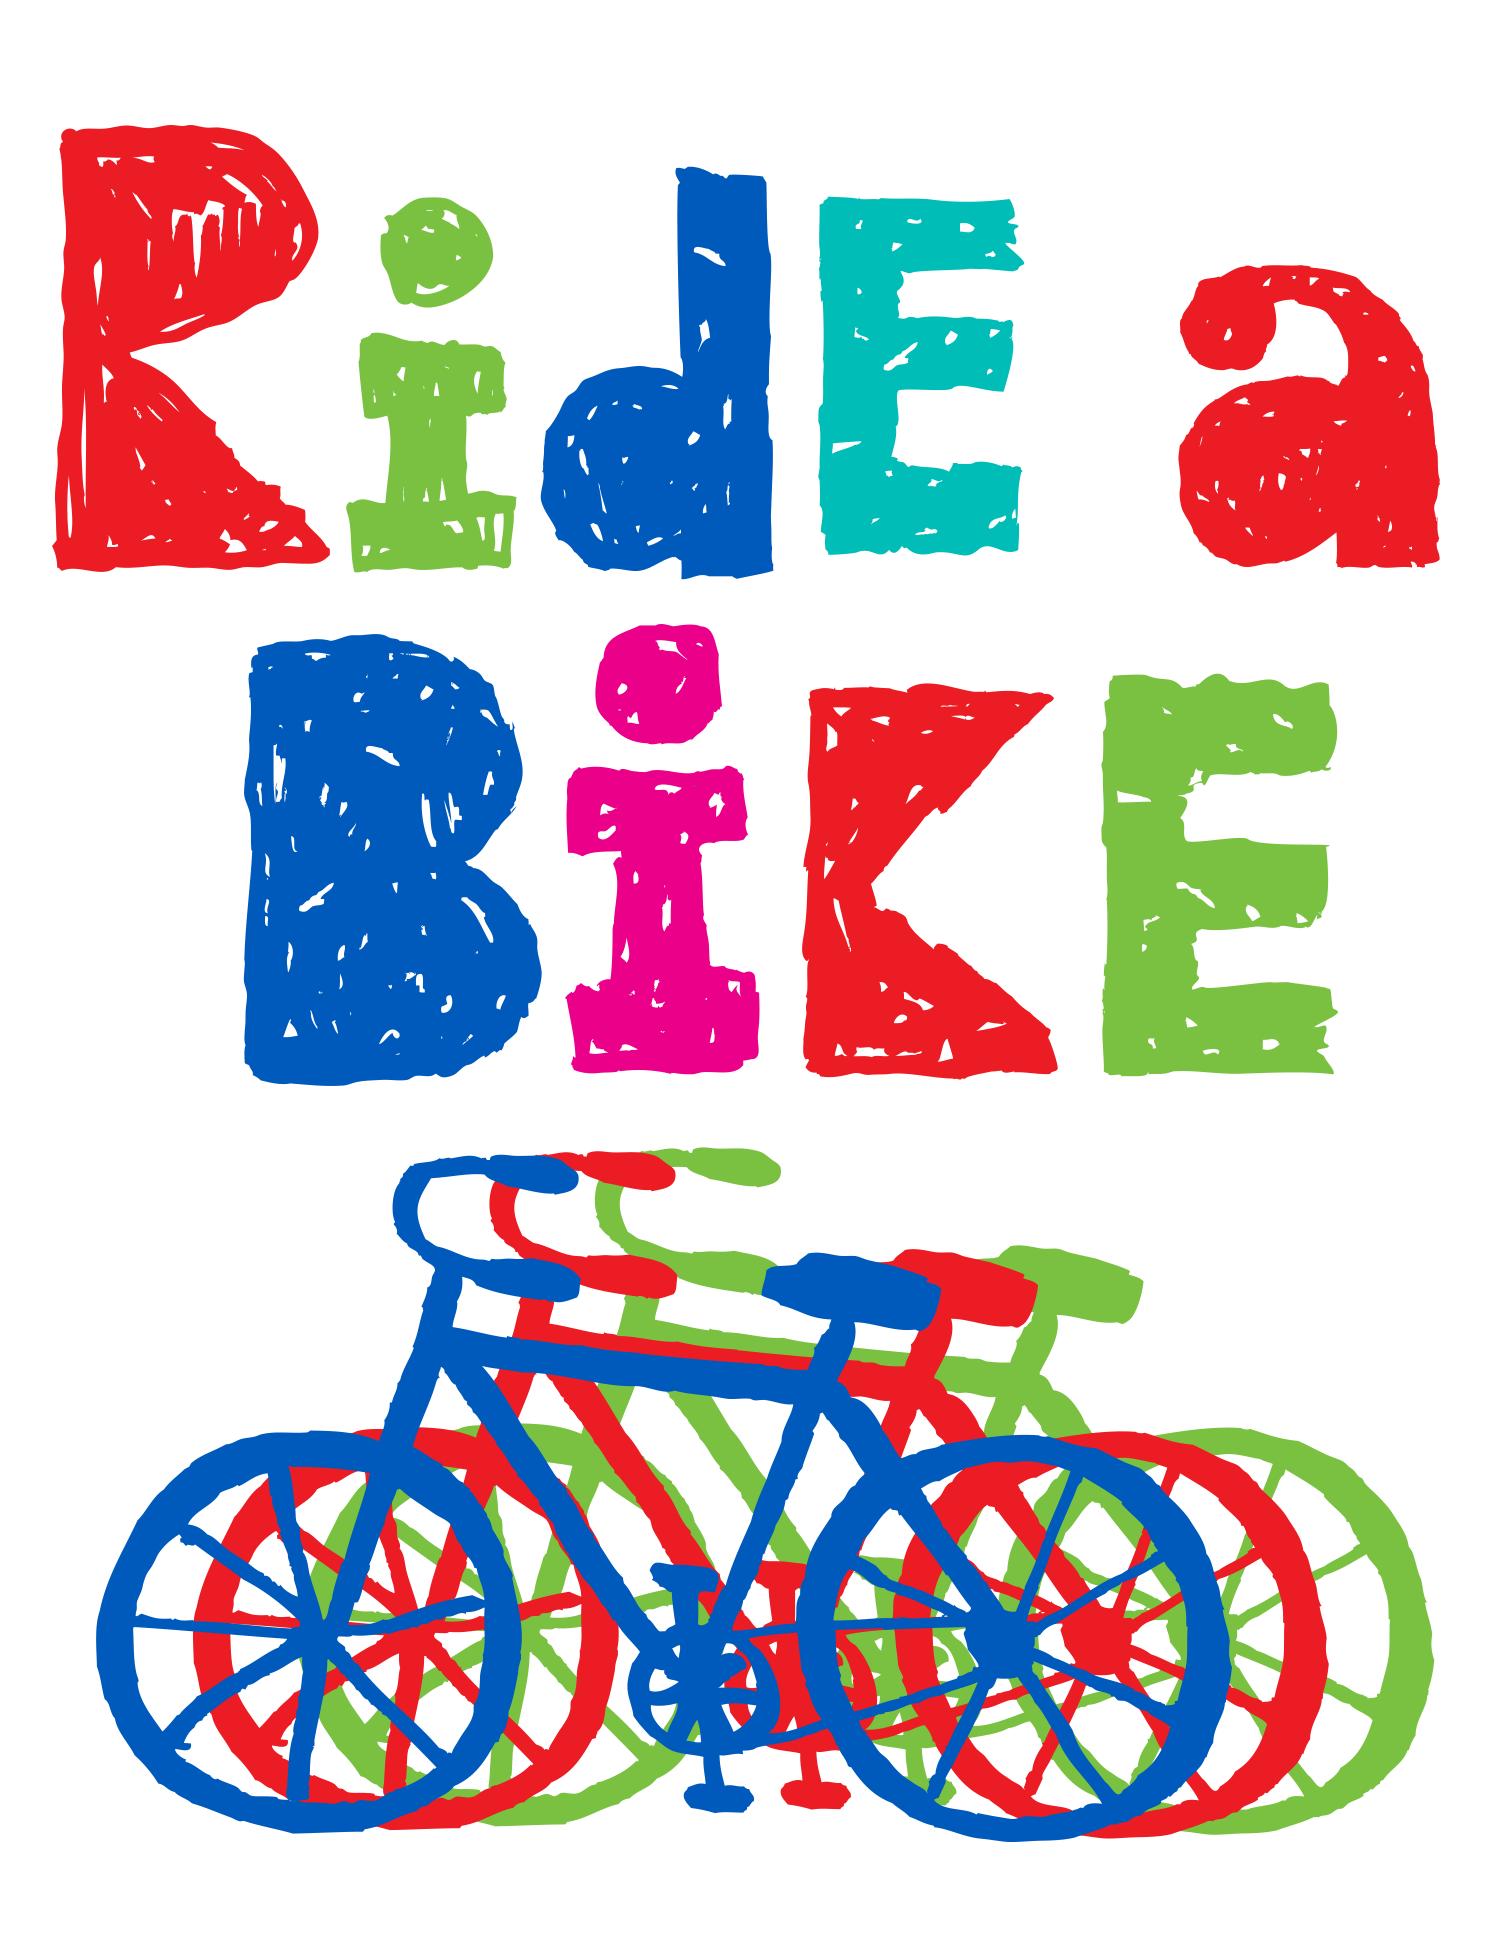 ride_a_bike_sketchy_type_andi_bird.png